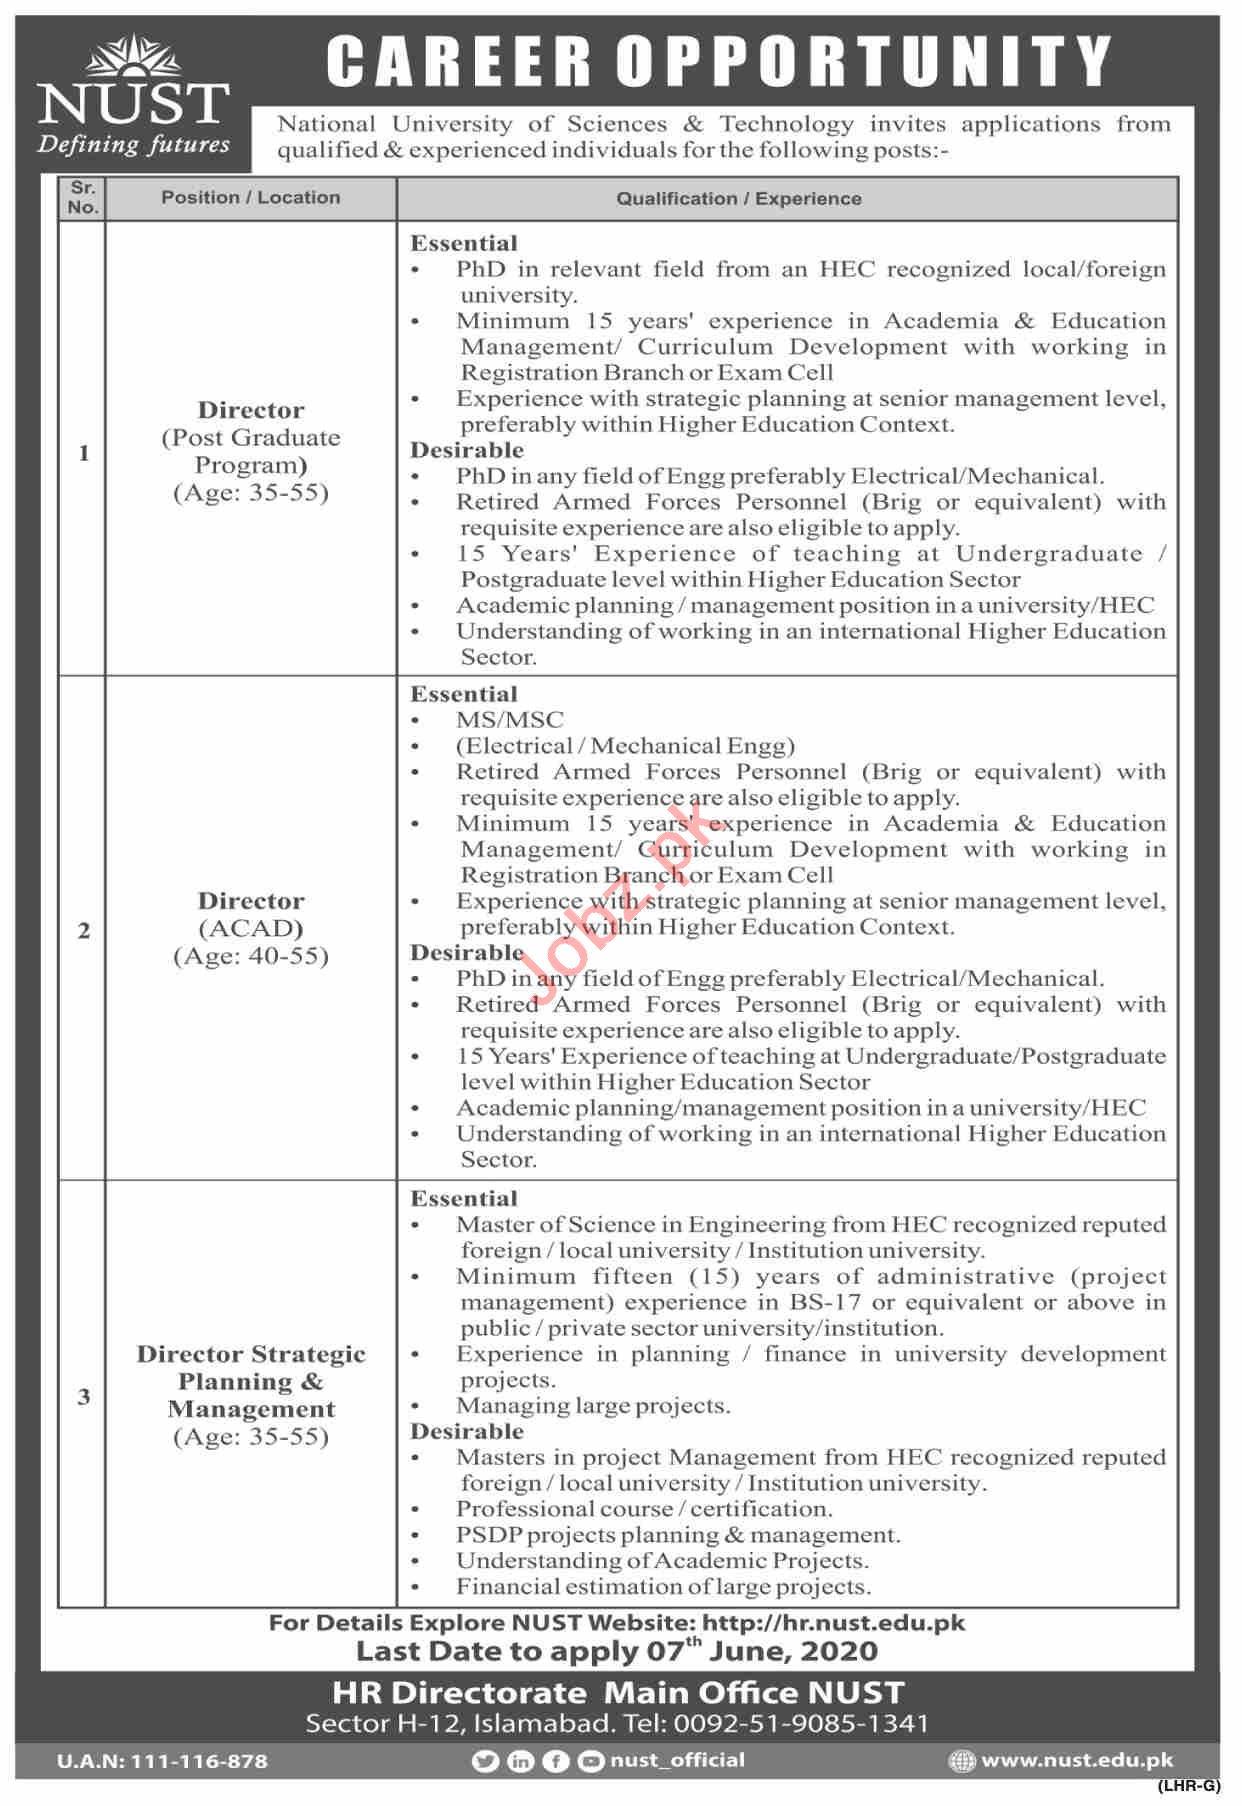 NUST University Islamabad Jobs 2020 for Directors